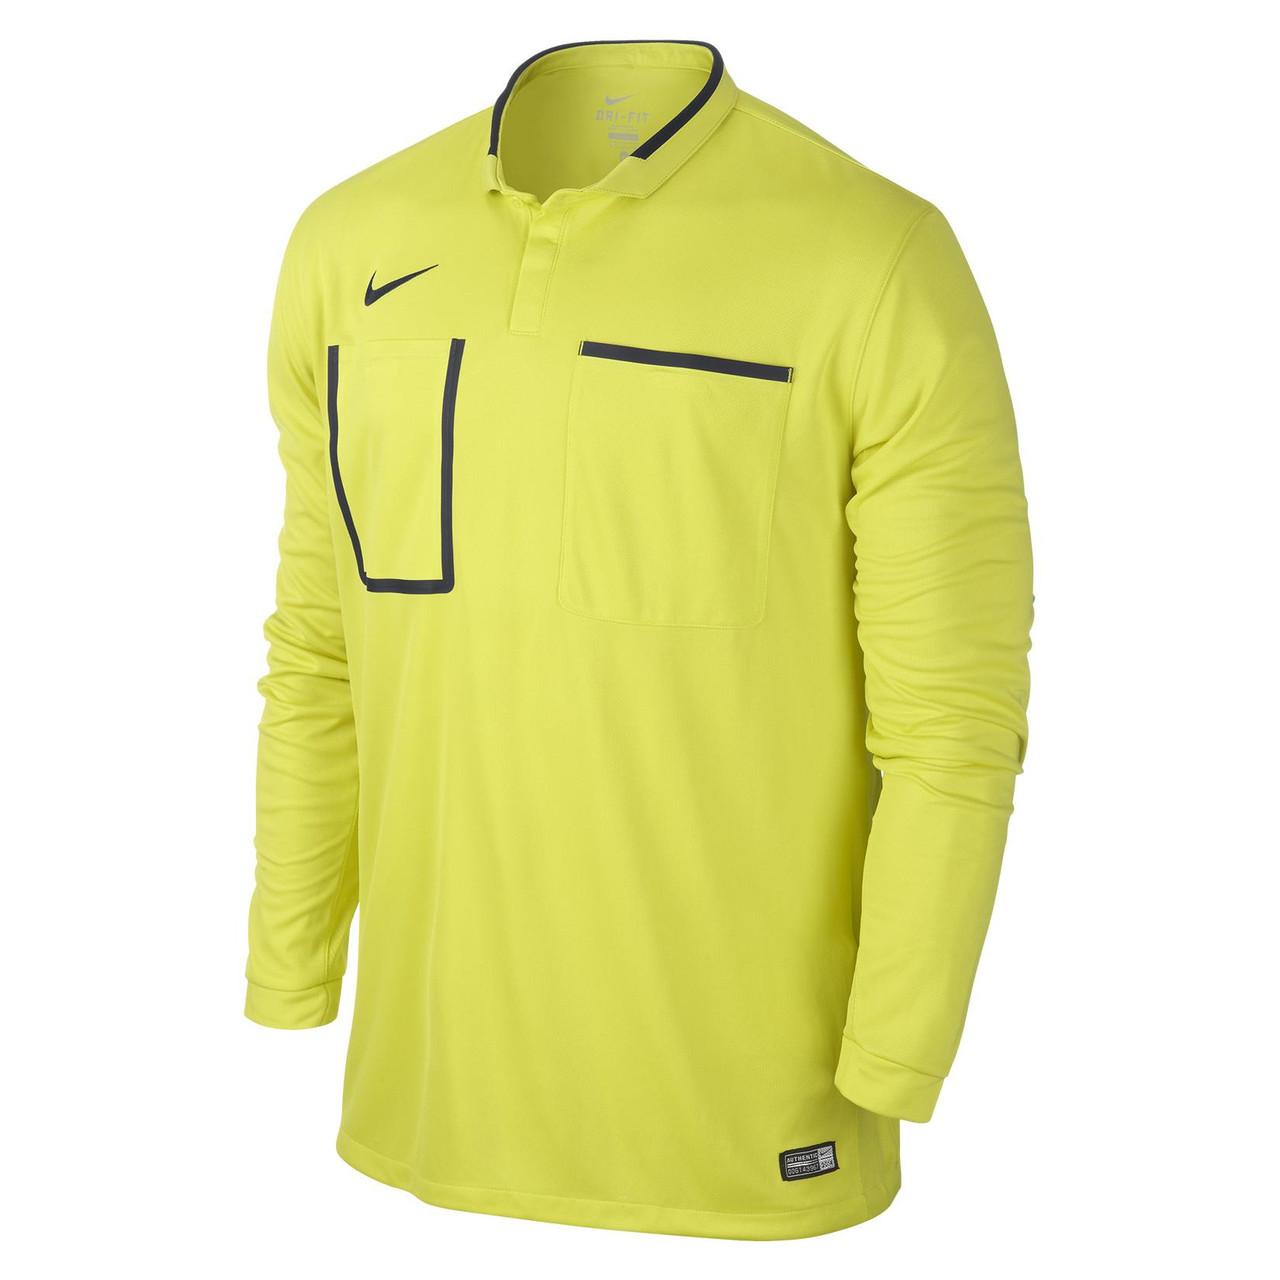 Футболки мужские TEAM-каталог Nike Referee Jersey Long Sleeve 619170-358(05-04-01-03) S